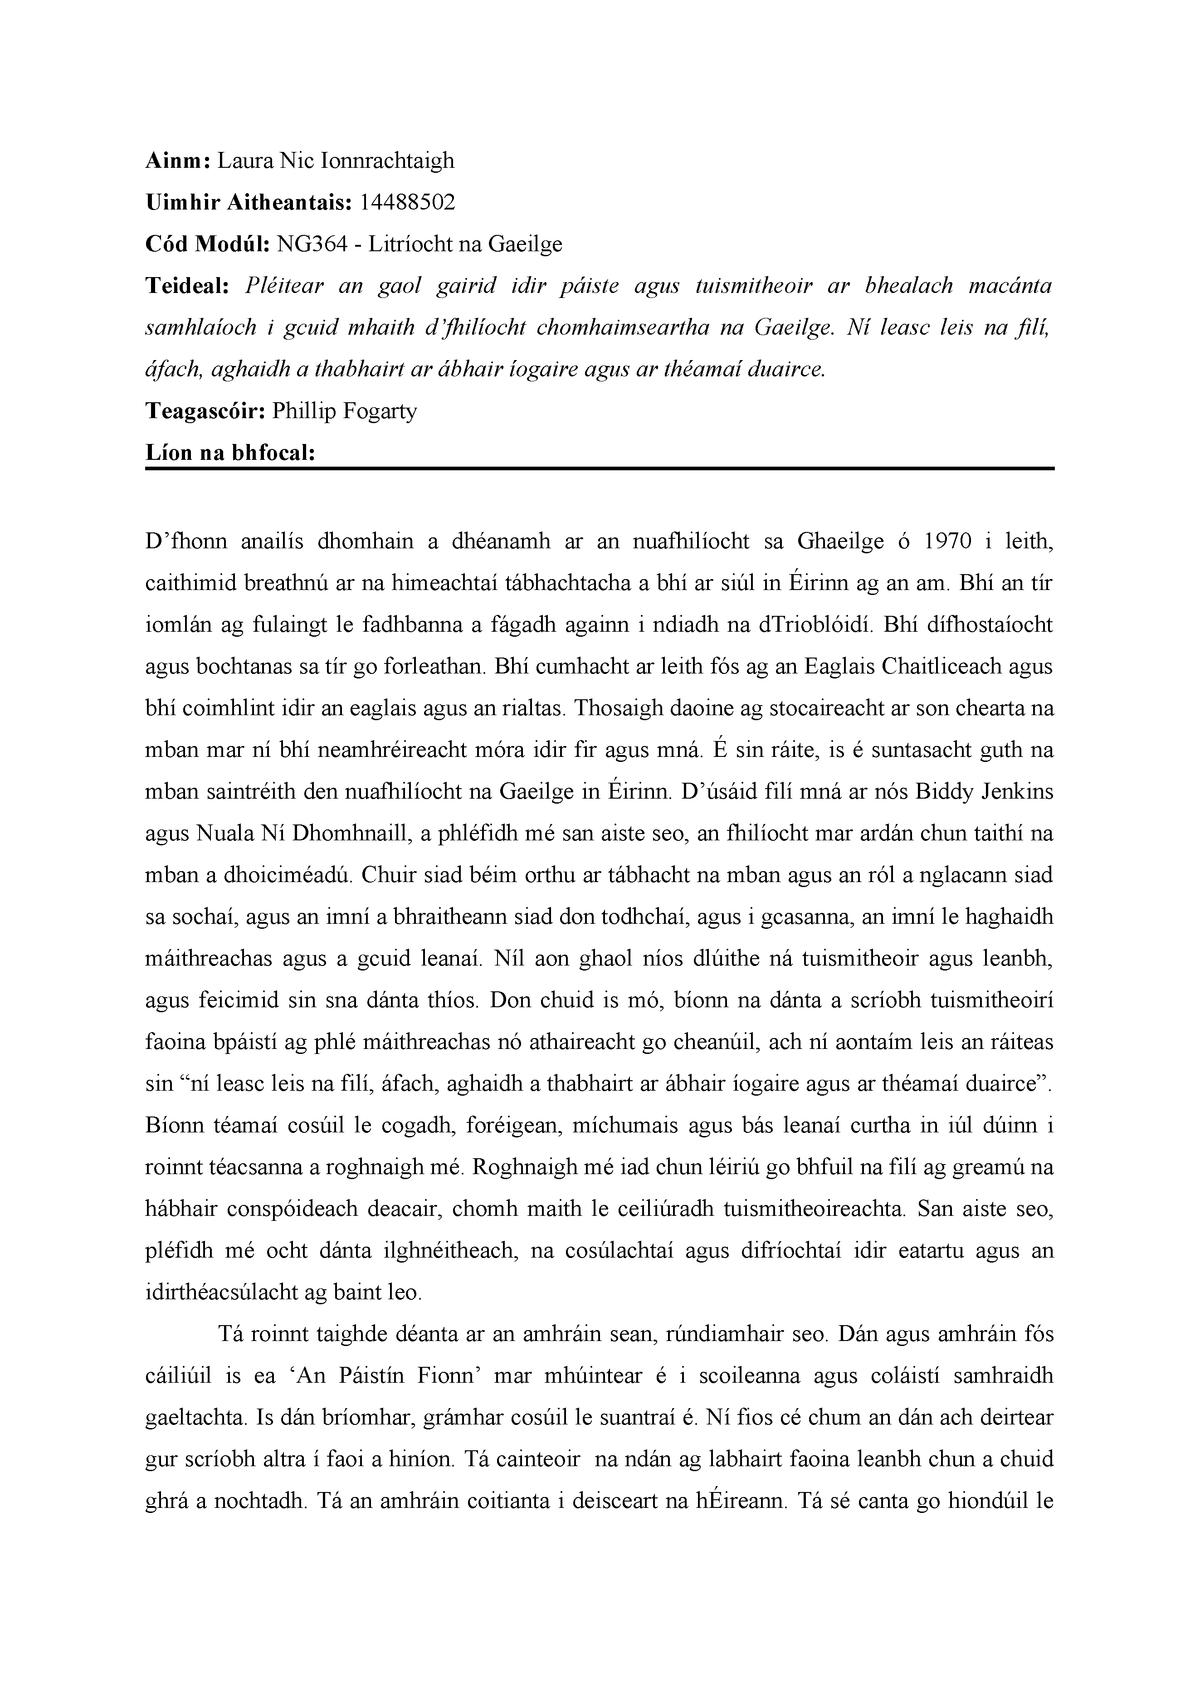 Buy long essay online